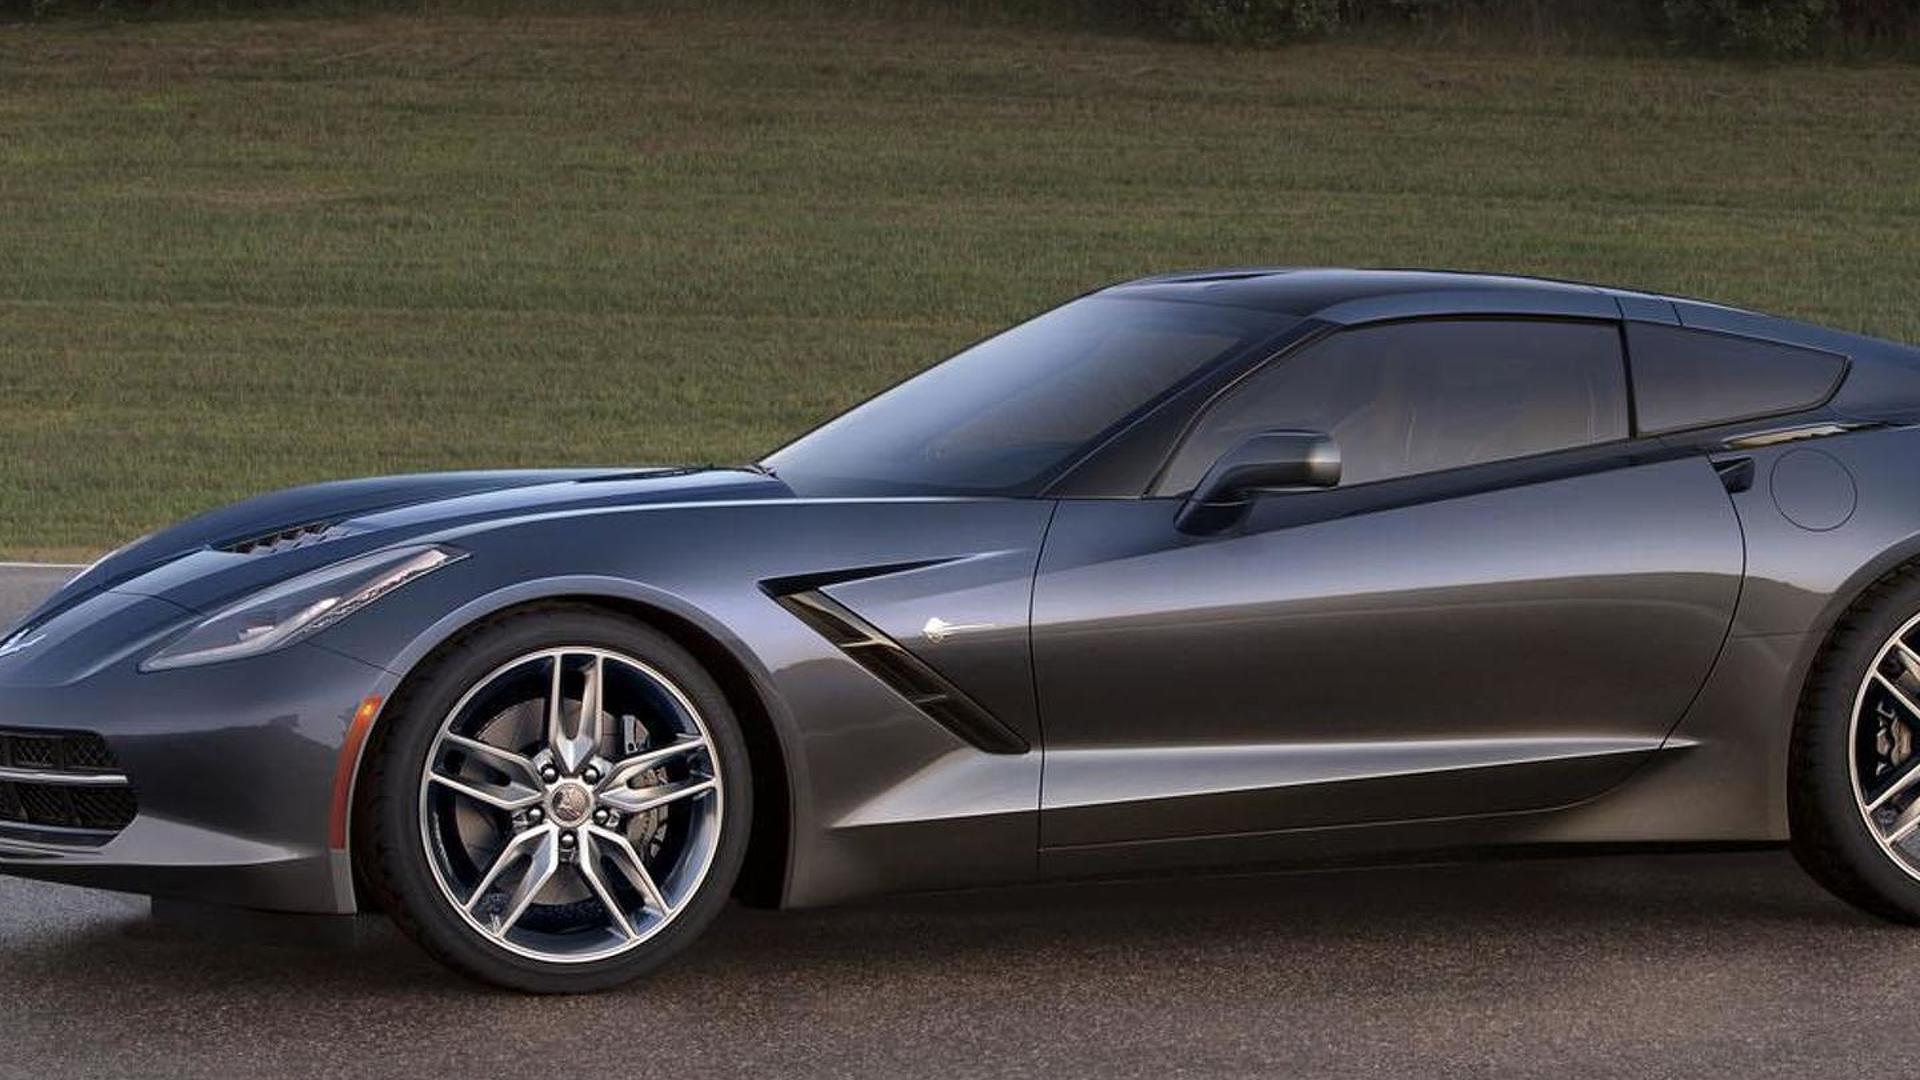 Chevrolet working on an entry-level Corvette for 2015 - report